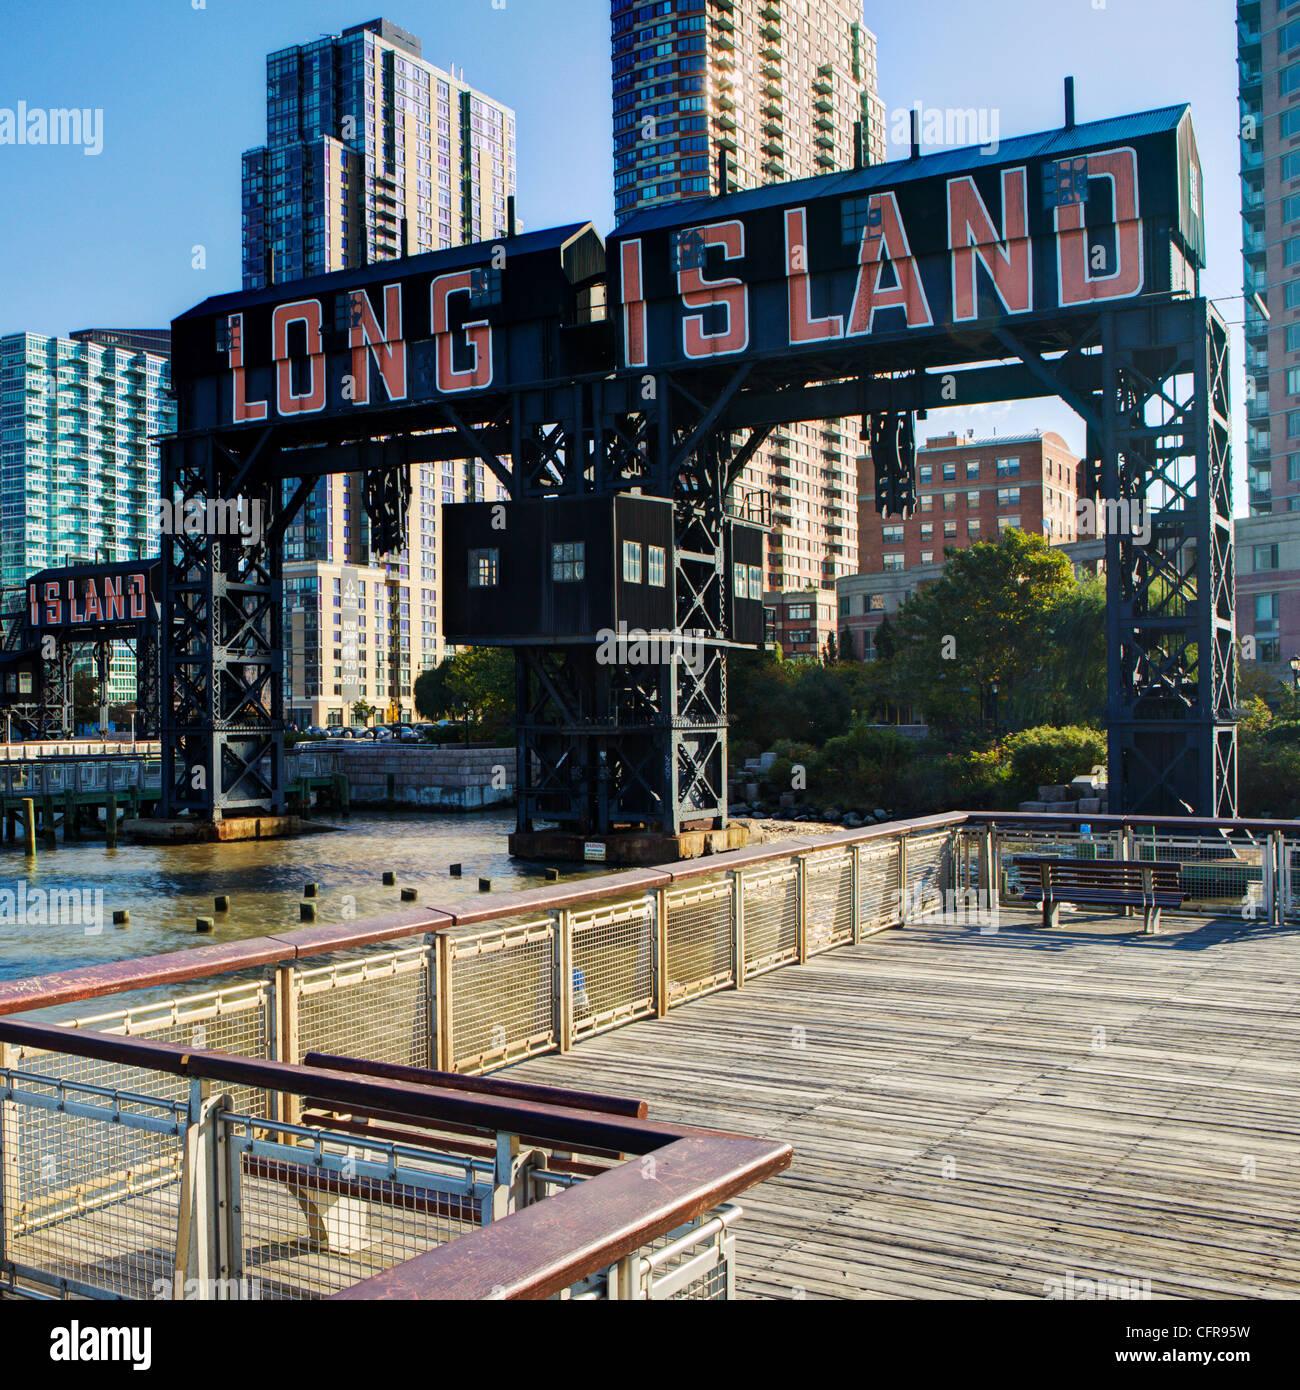 Long Island City Ny: Long Island, Queens, New York City, New York, United